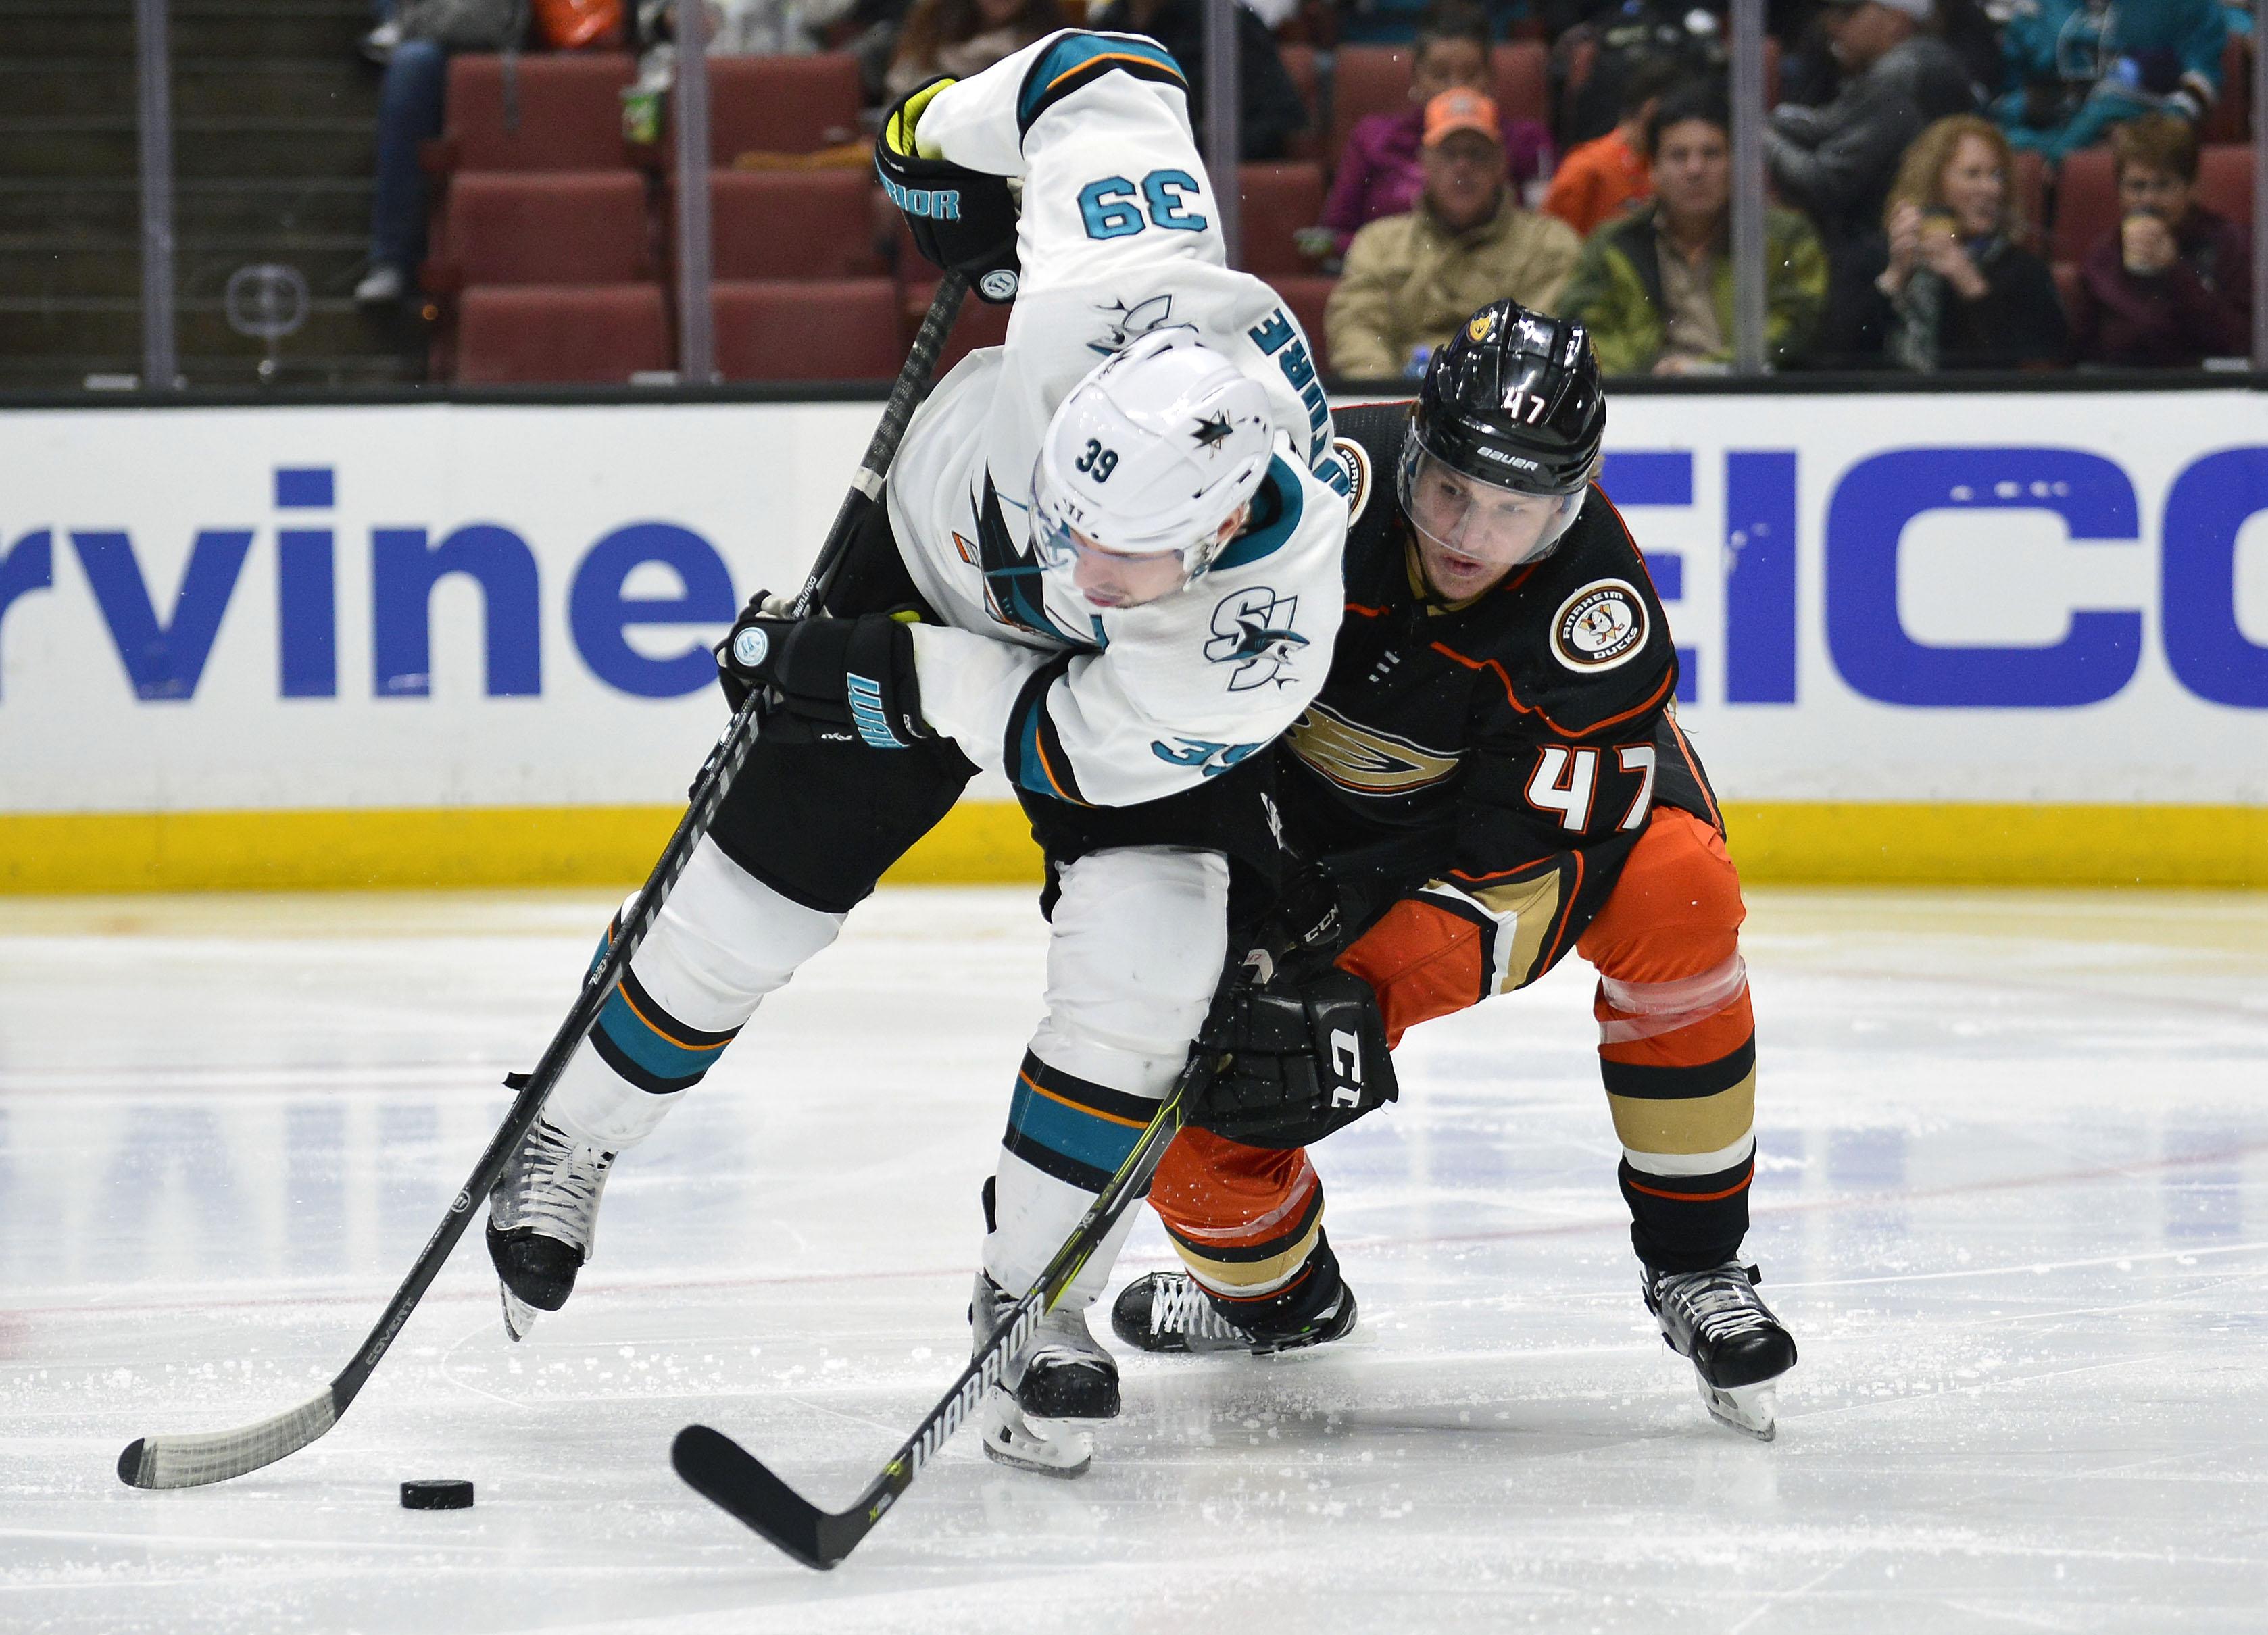 January 21, 2018; Anaheim, CA, USA; Anaheim Ducks defenseman Hampus Lindholm (47) plays for the puck against San Jose Sharks center Logan Couture (39) during the third period at Honda Center.